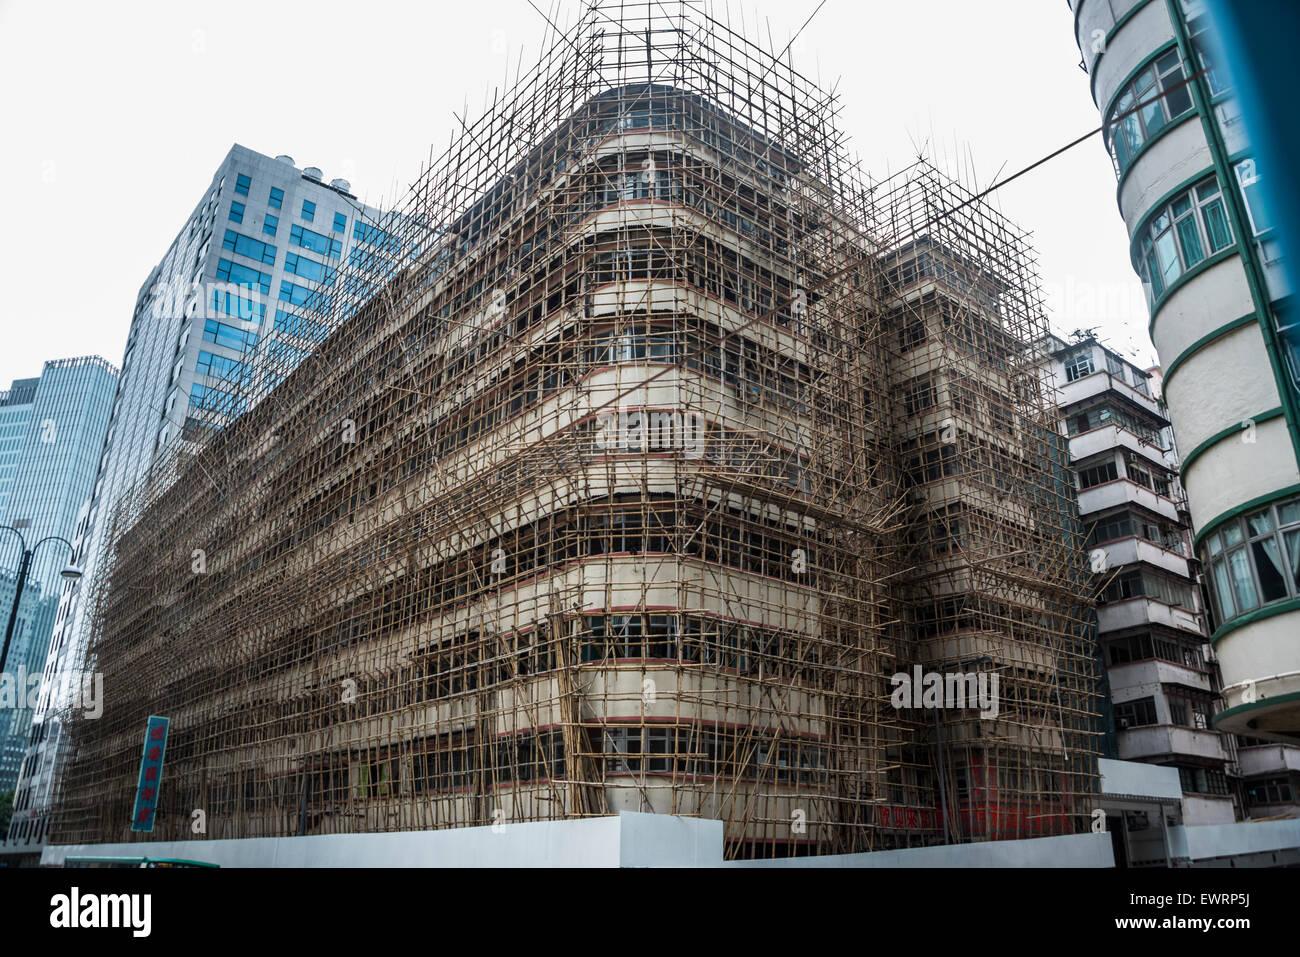 Bambus Gerust Hong Kong Stockfoto Bild 84730174 Alamy